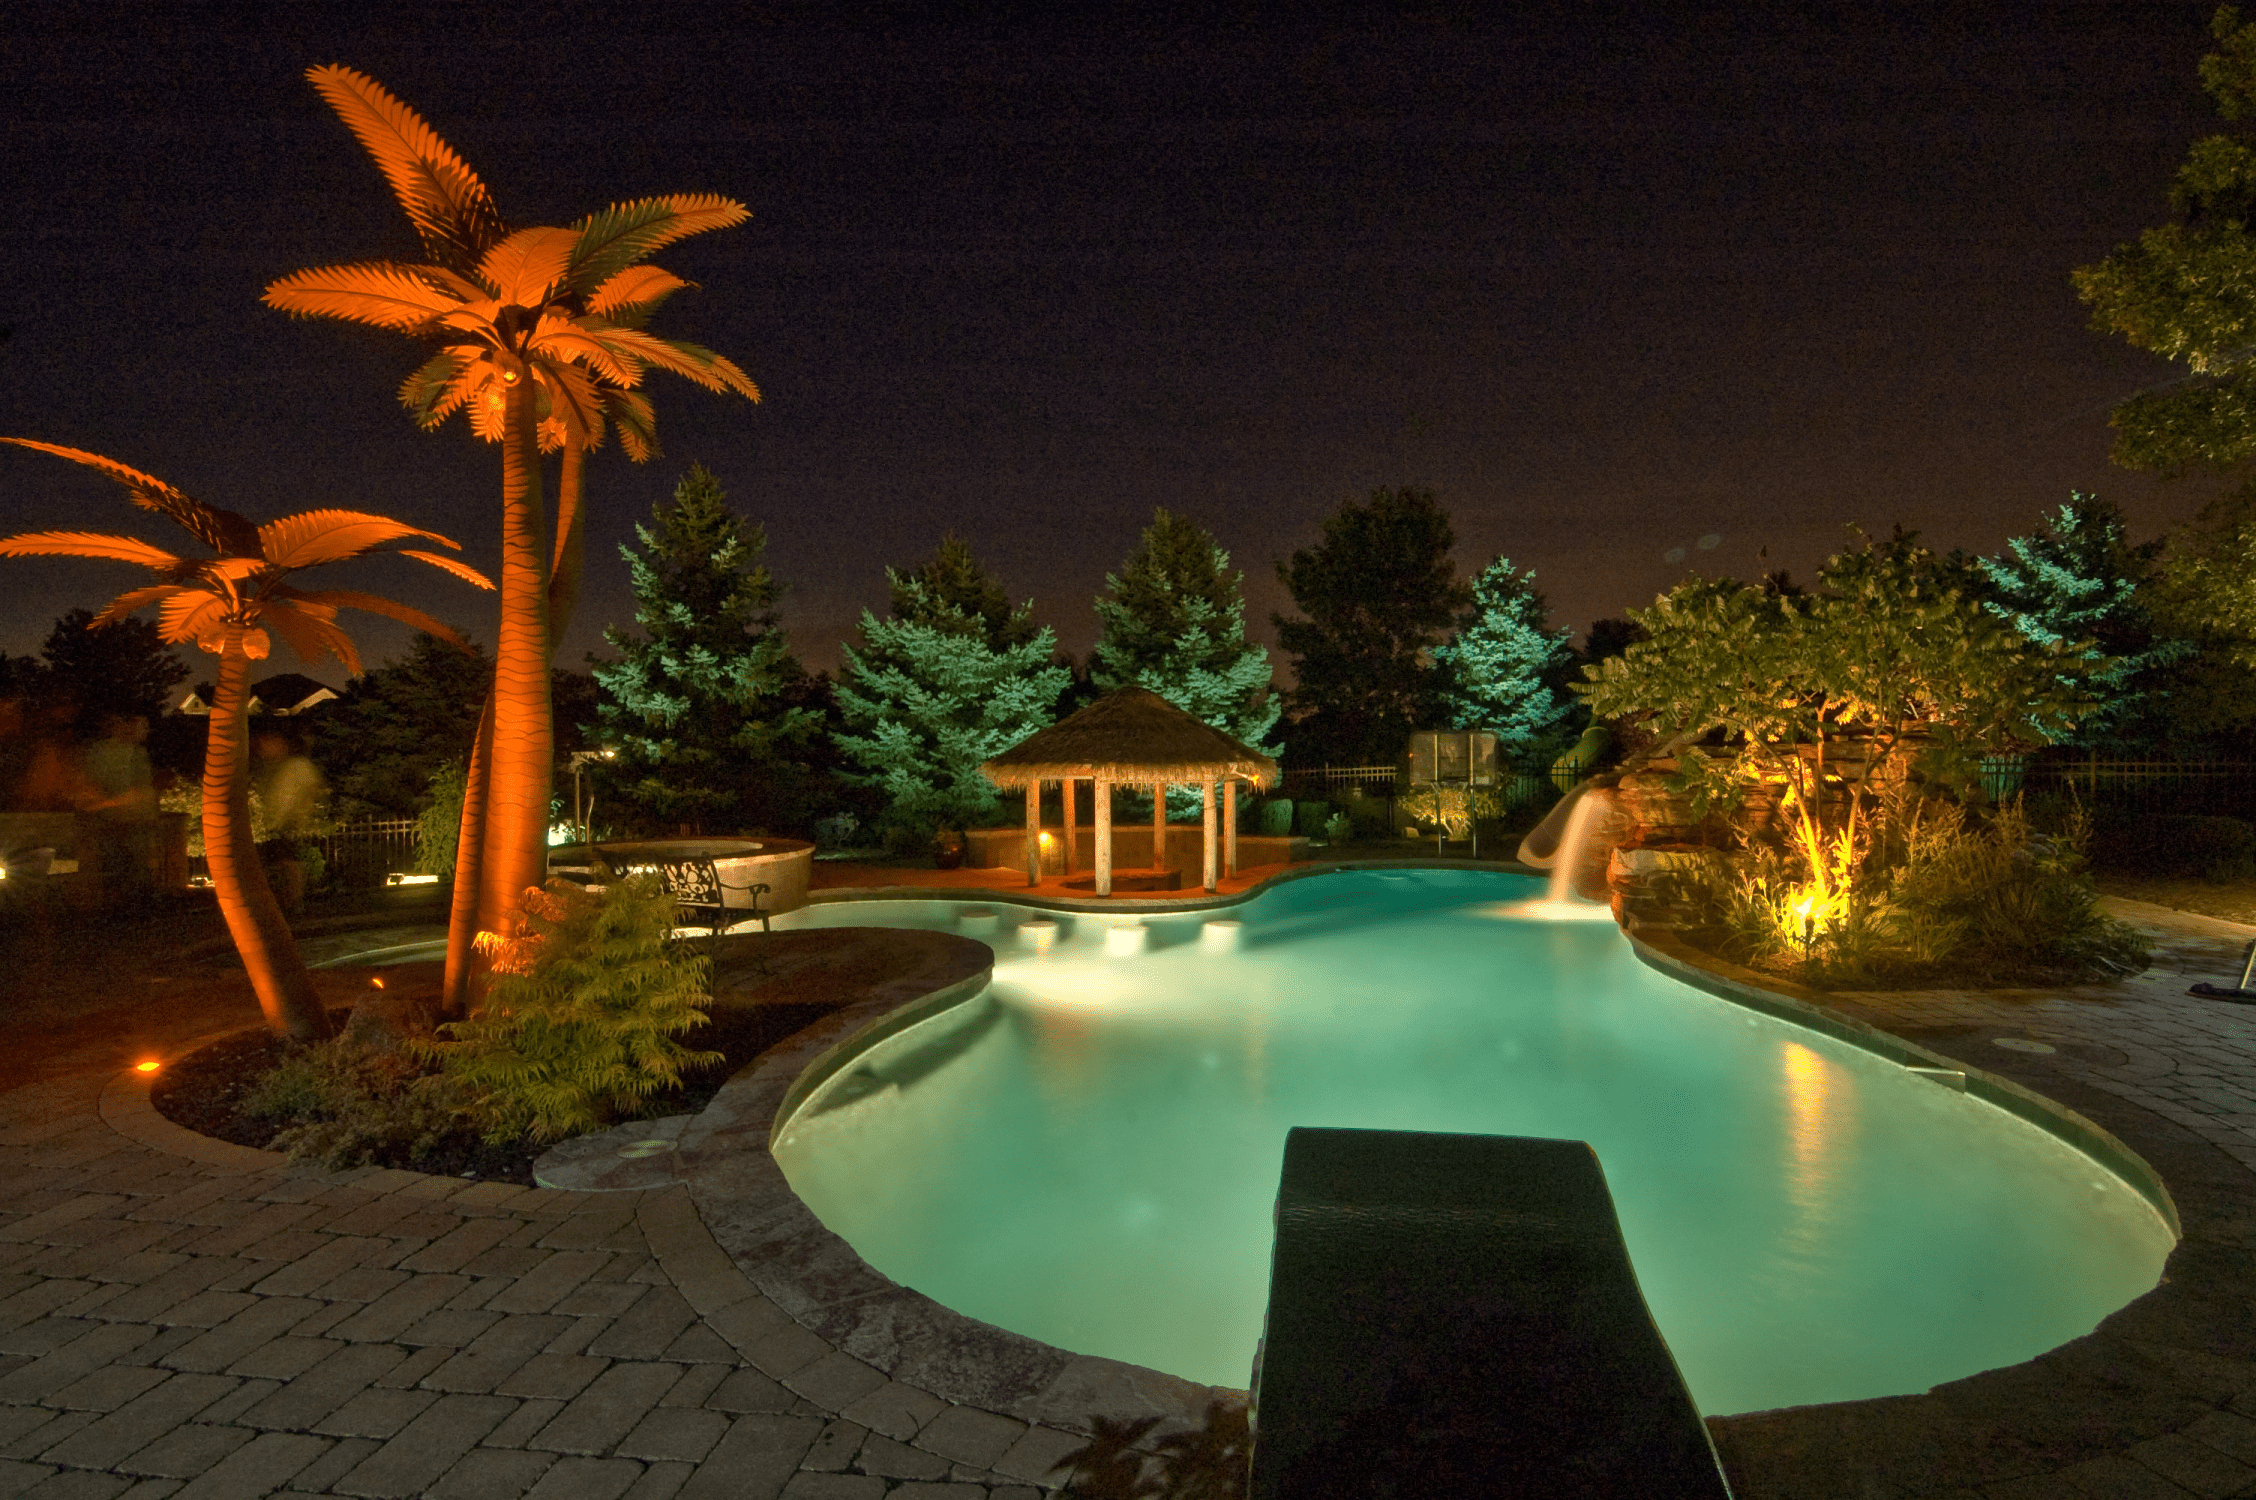 Frankfort Pool Lighting - Outdoor Lighting in Chicago, IL ...